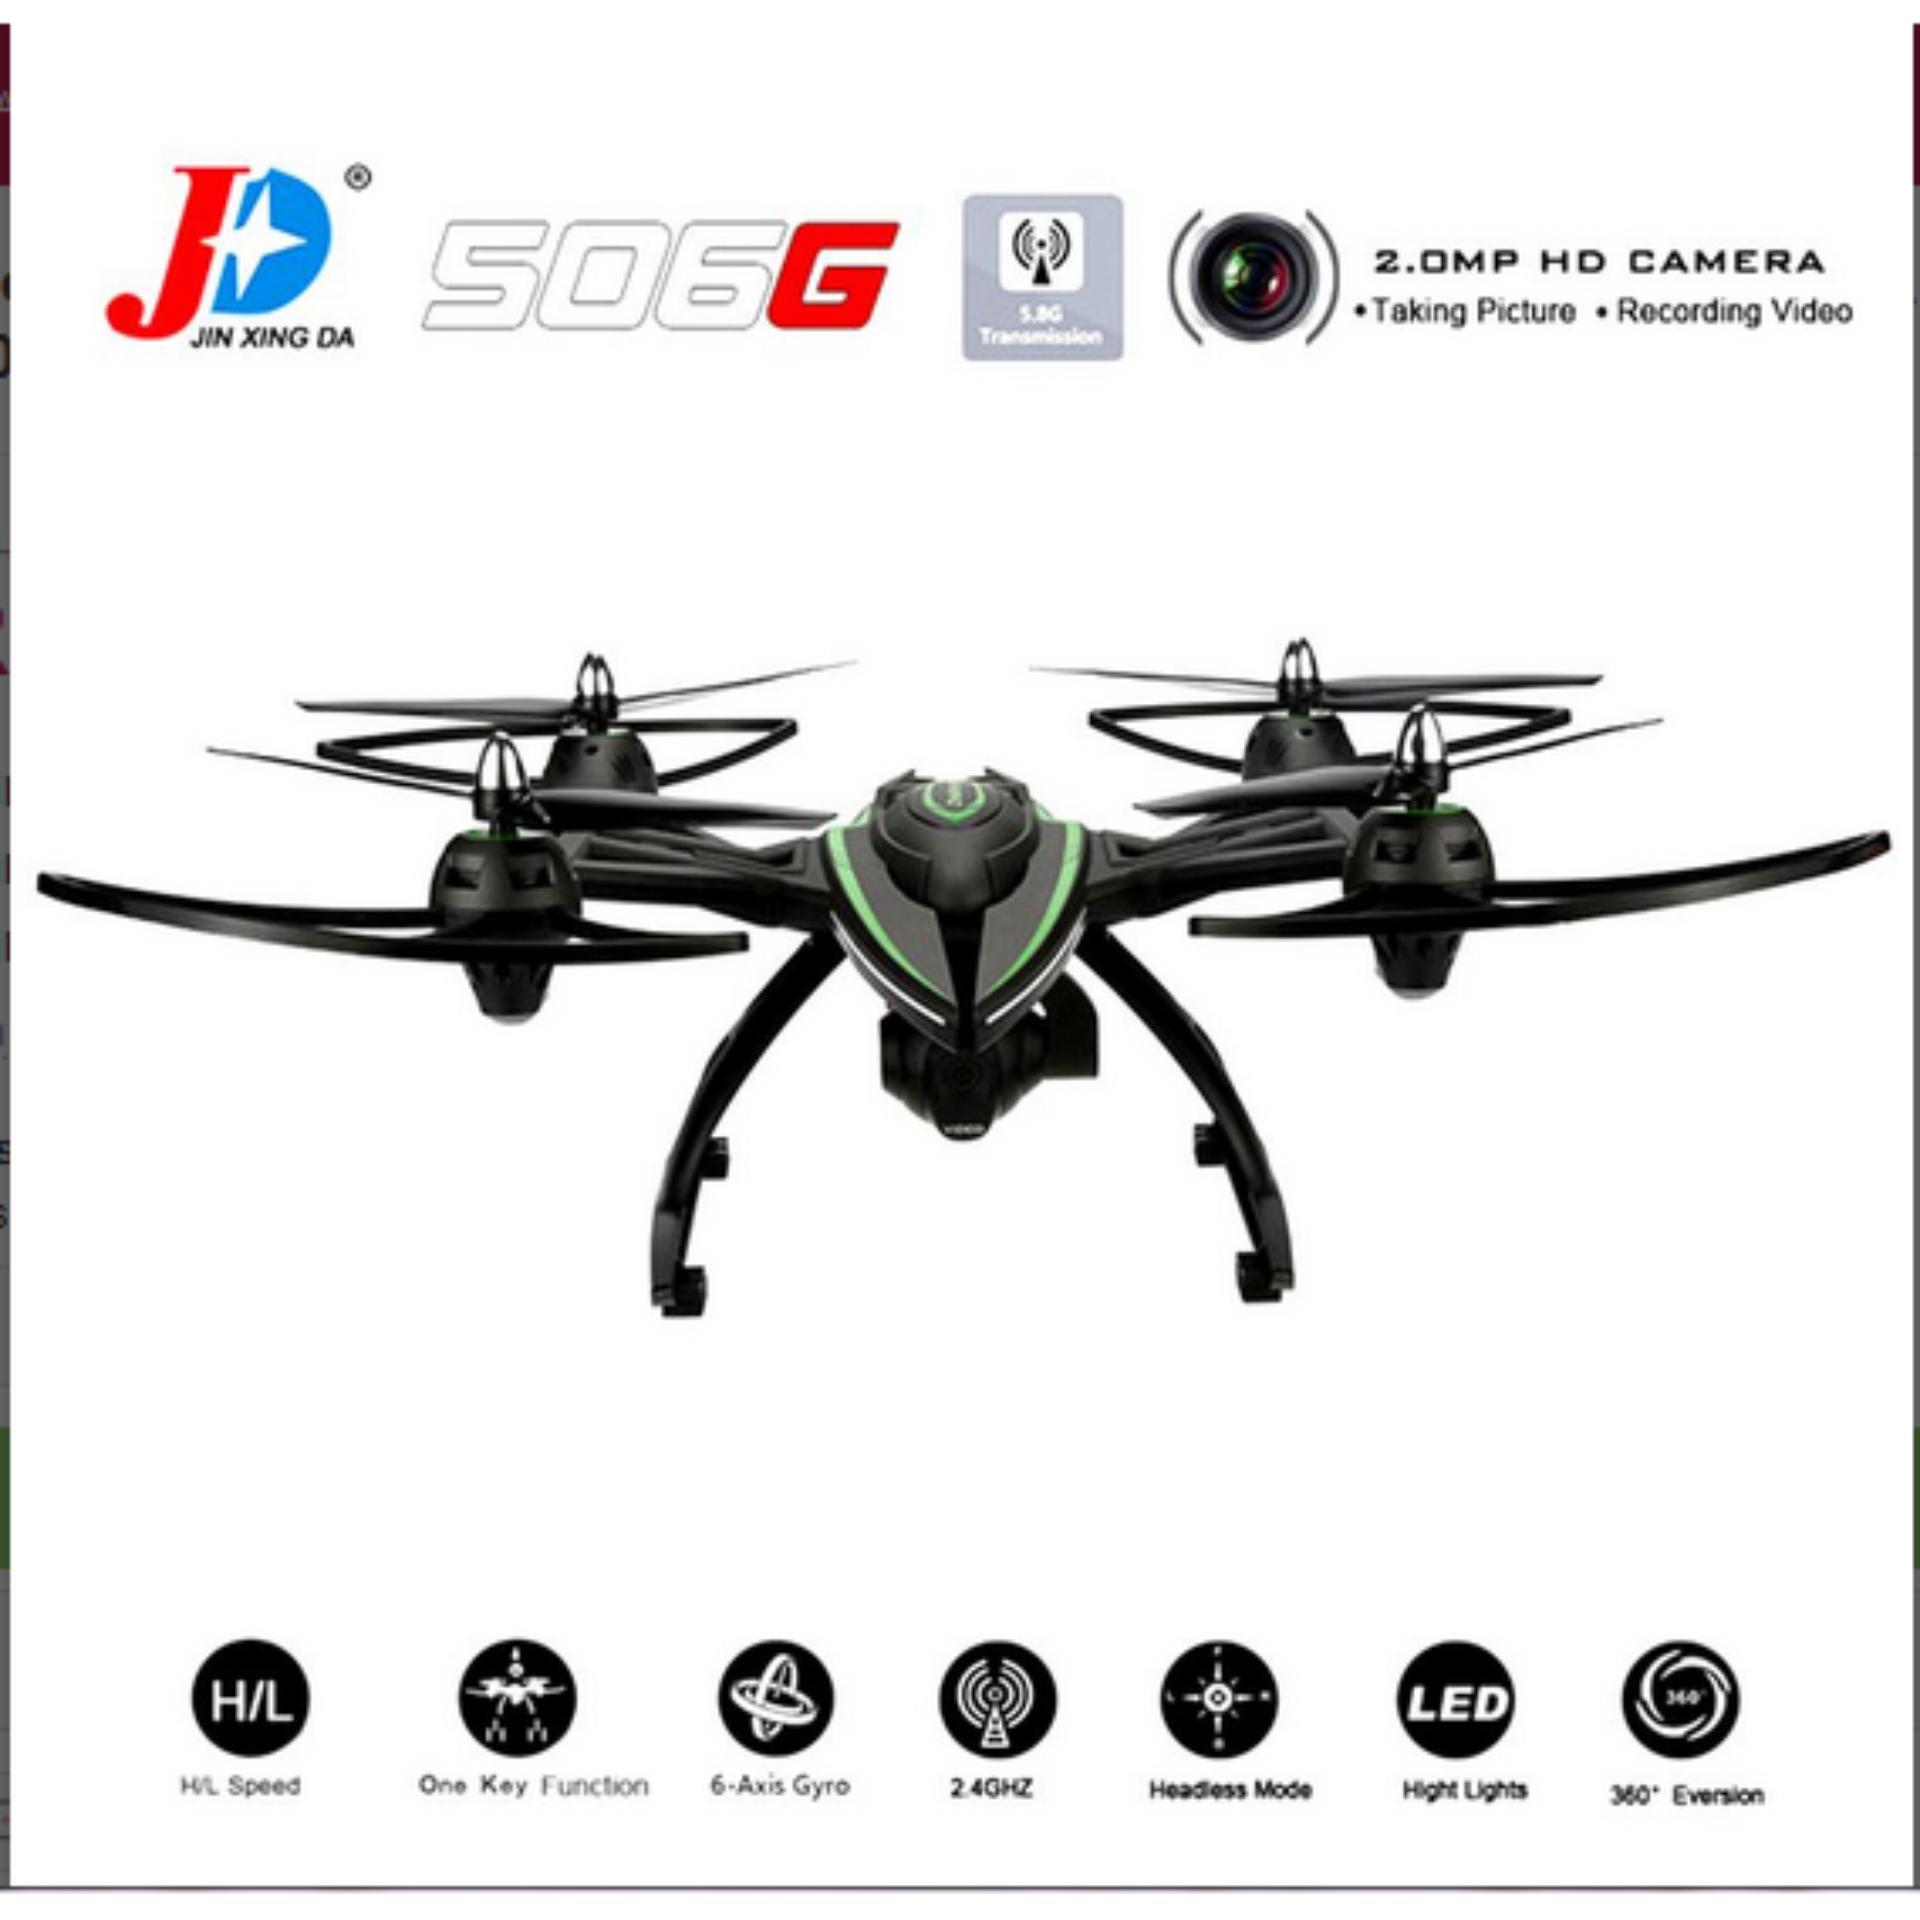 Quadcopter Huajun U Fly W606 3 58g Fpv 2 Mega Camera 24g 4 Channel 6 Syma X8w Rc Drone With Wifi Axis Support Action Cam Gopro Yi Hitam Big Jxd 506g Gyro